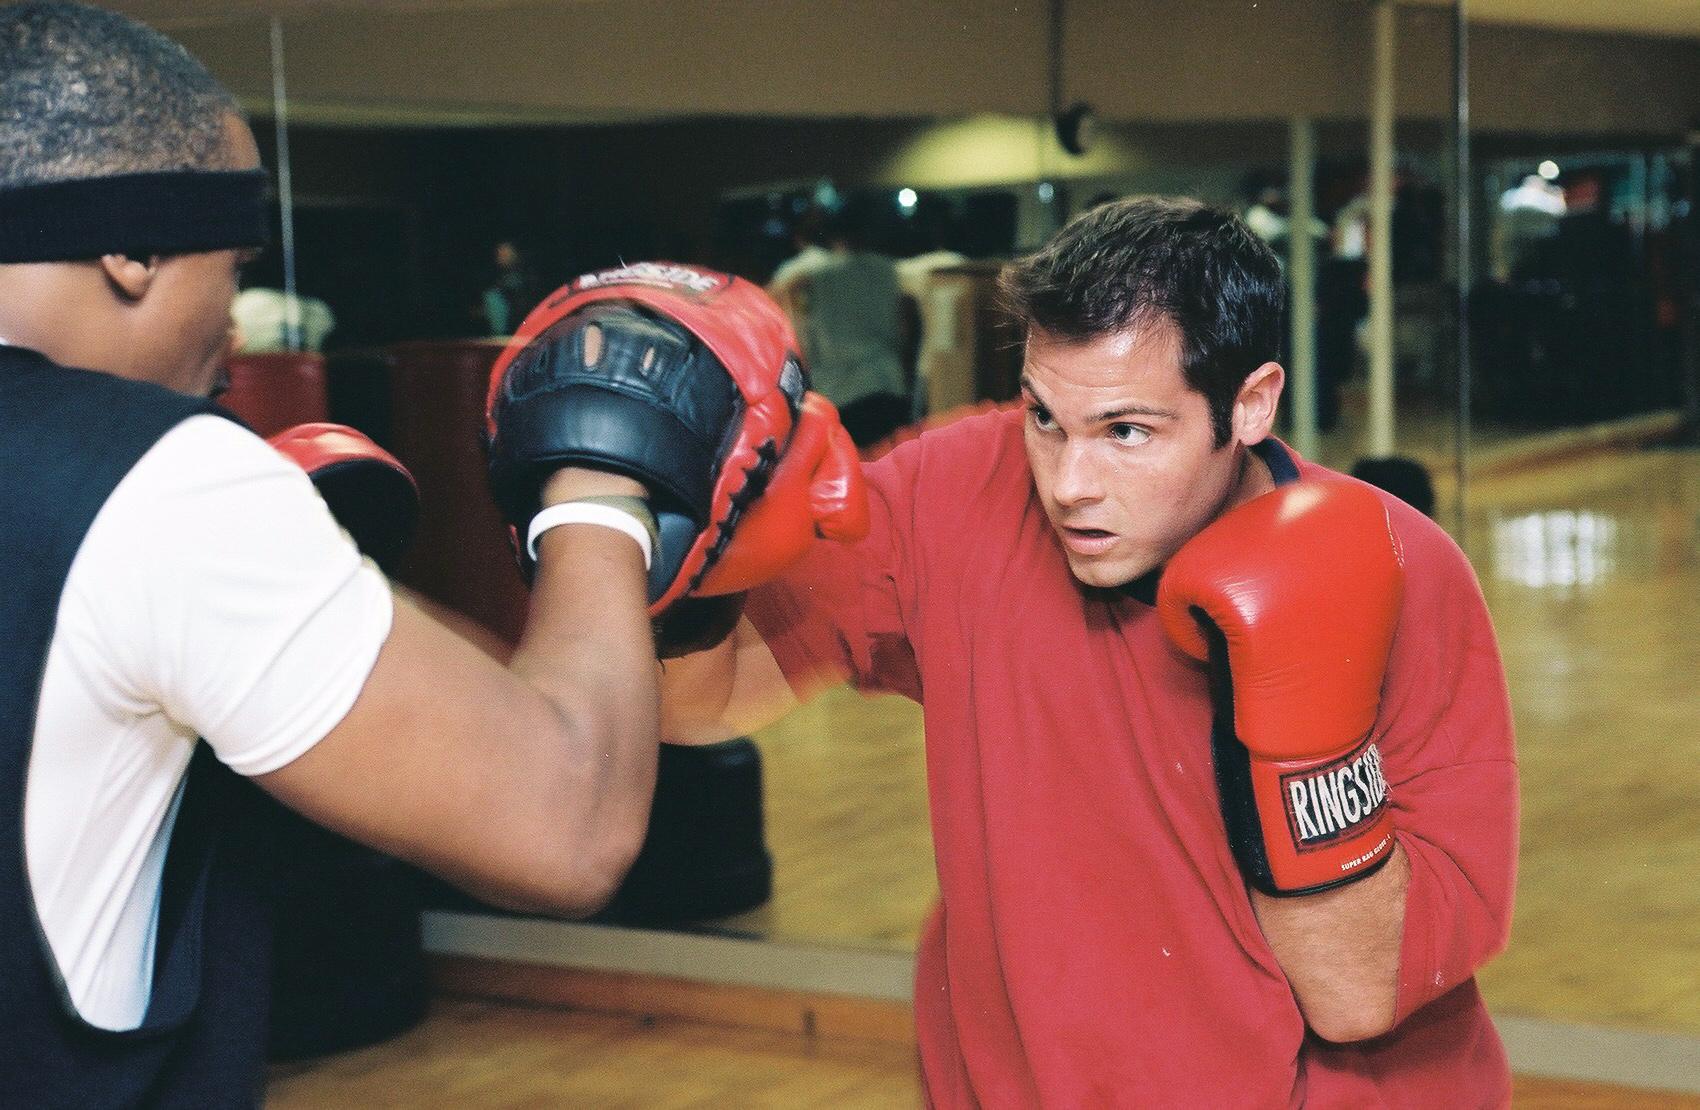 Sport fit success driven by constant improvement